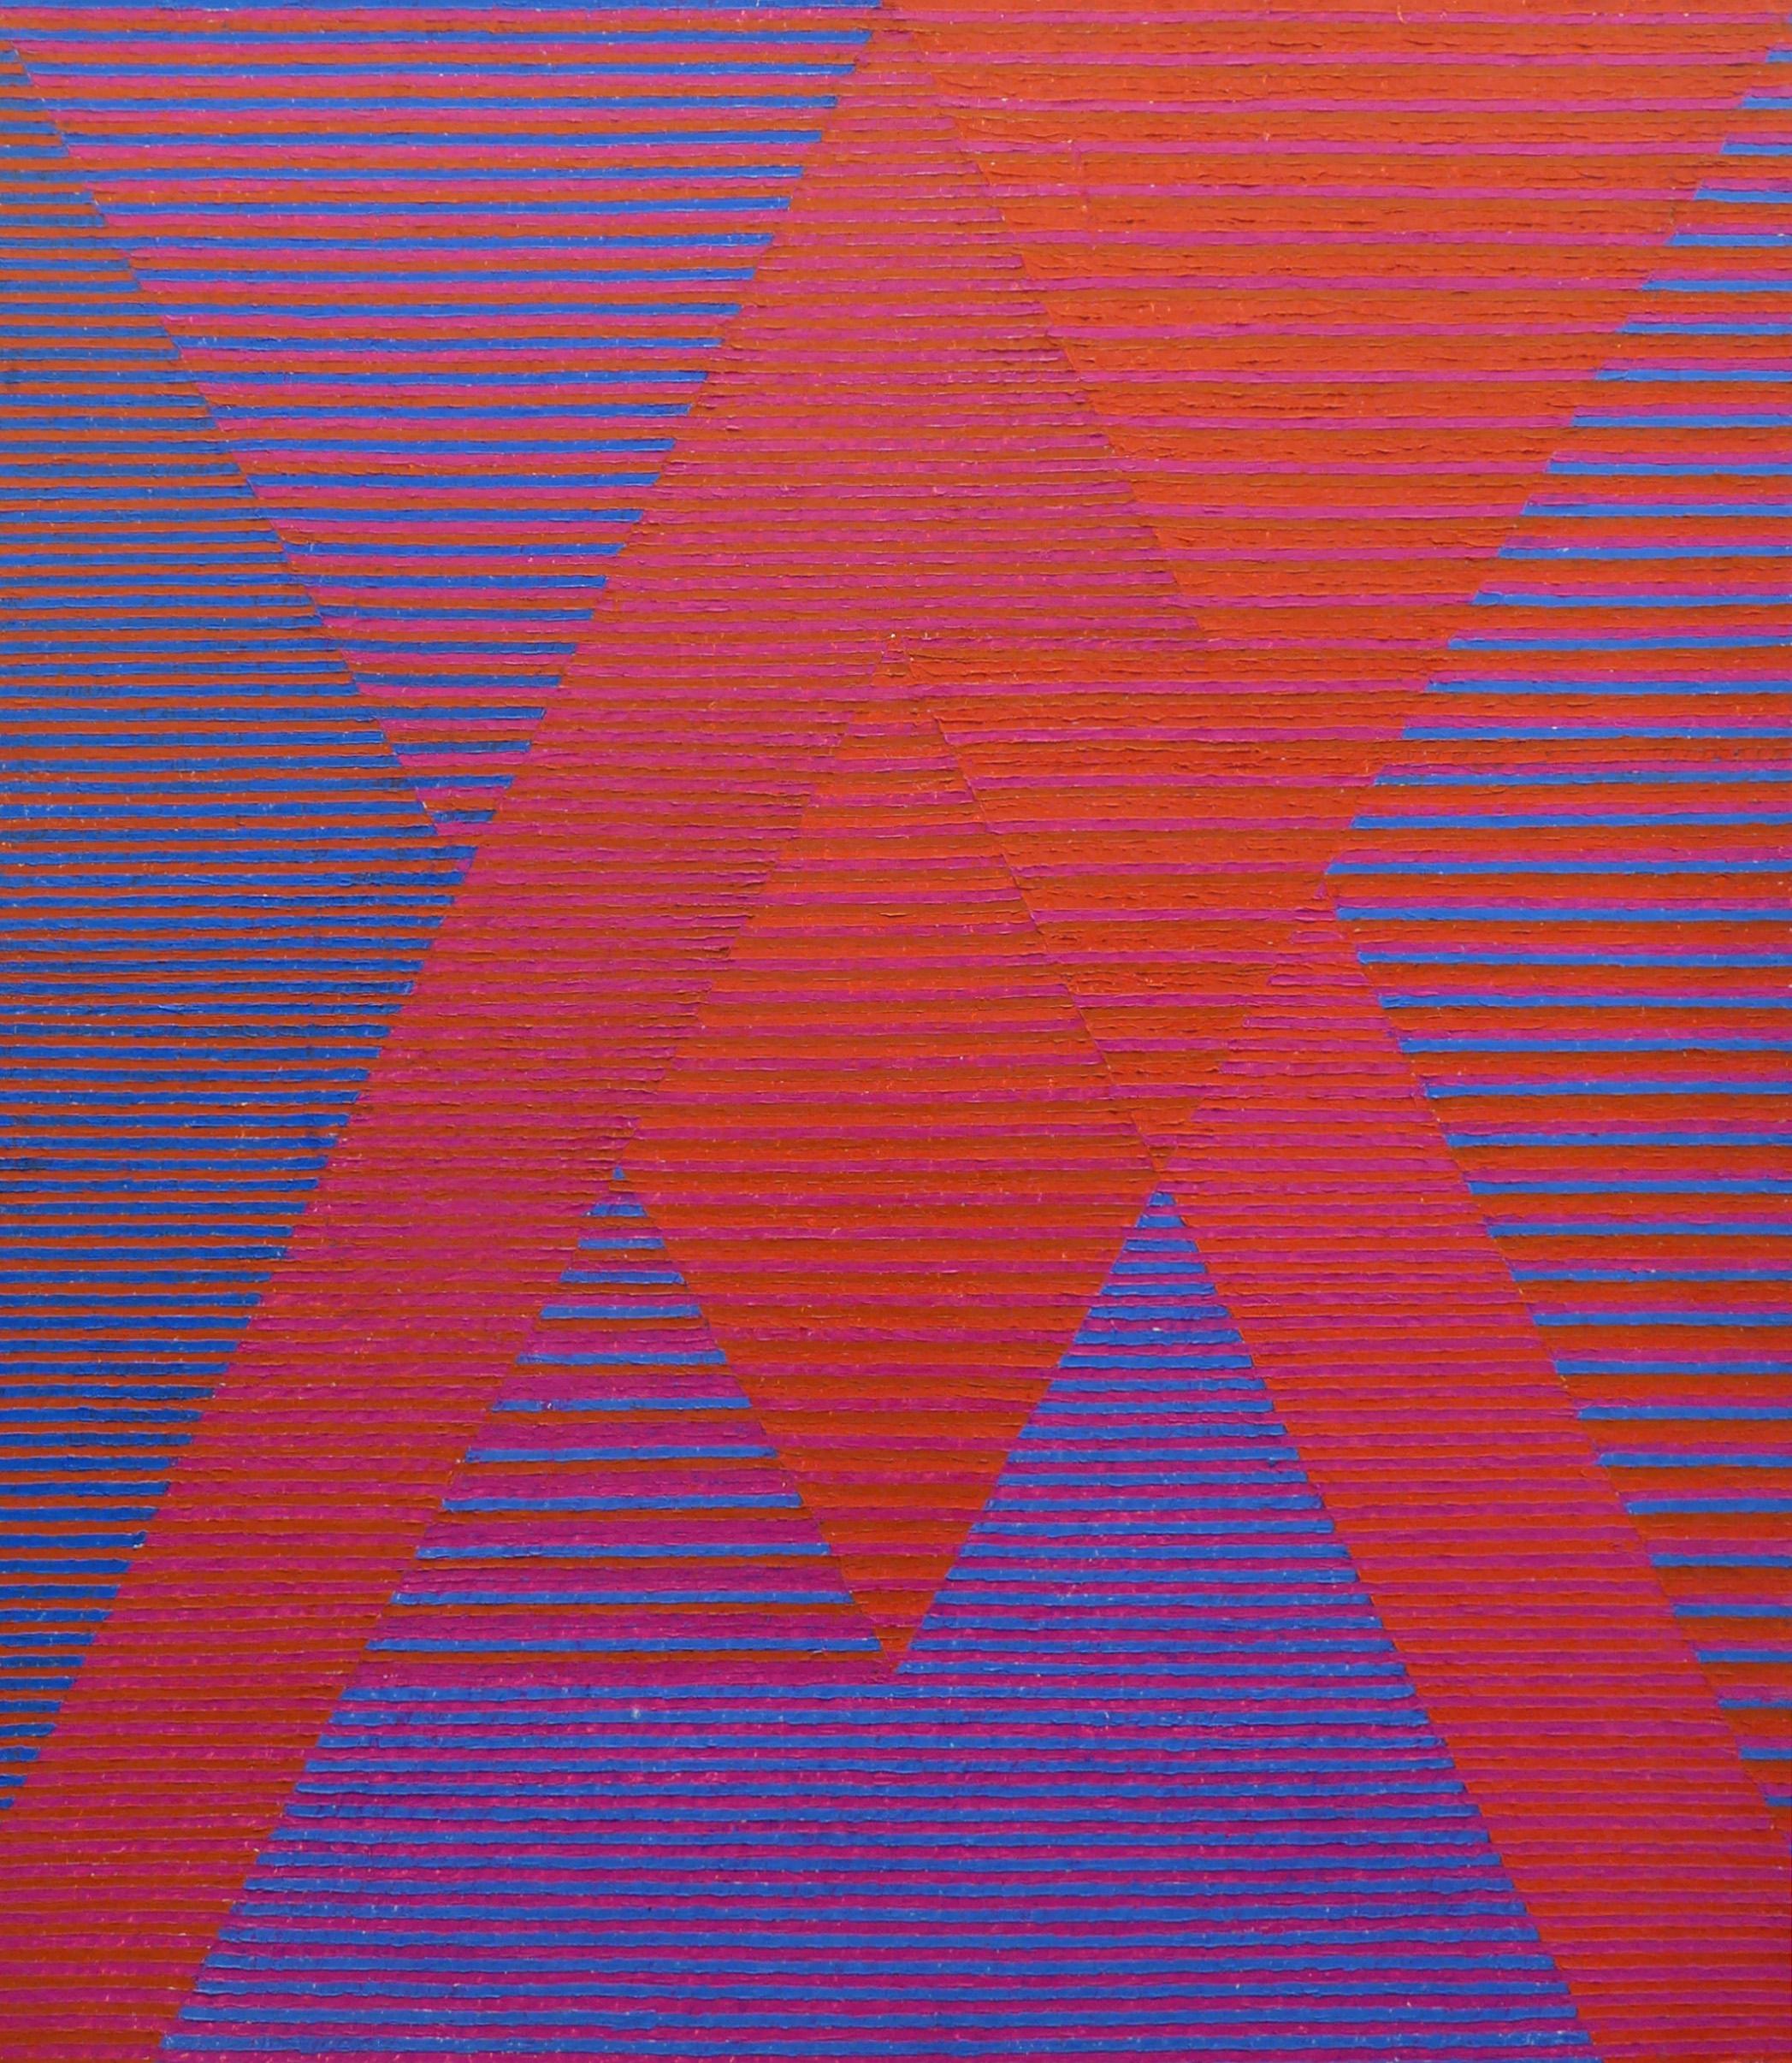 Lois Swirnoff, Intersections, 1955, oil on masonite, 30x26